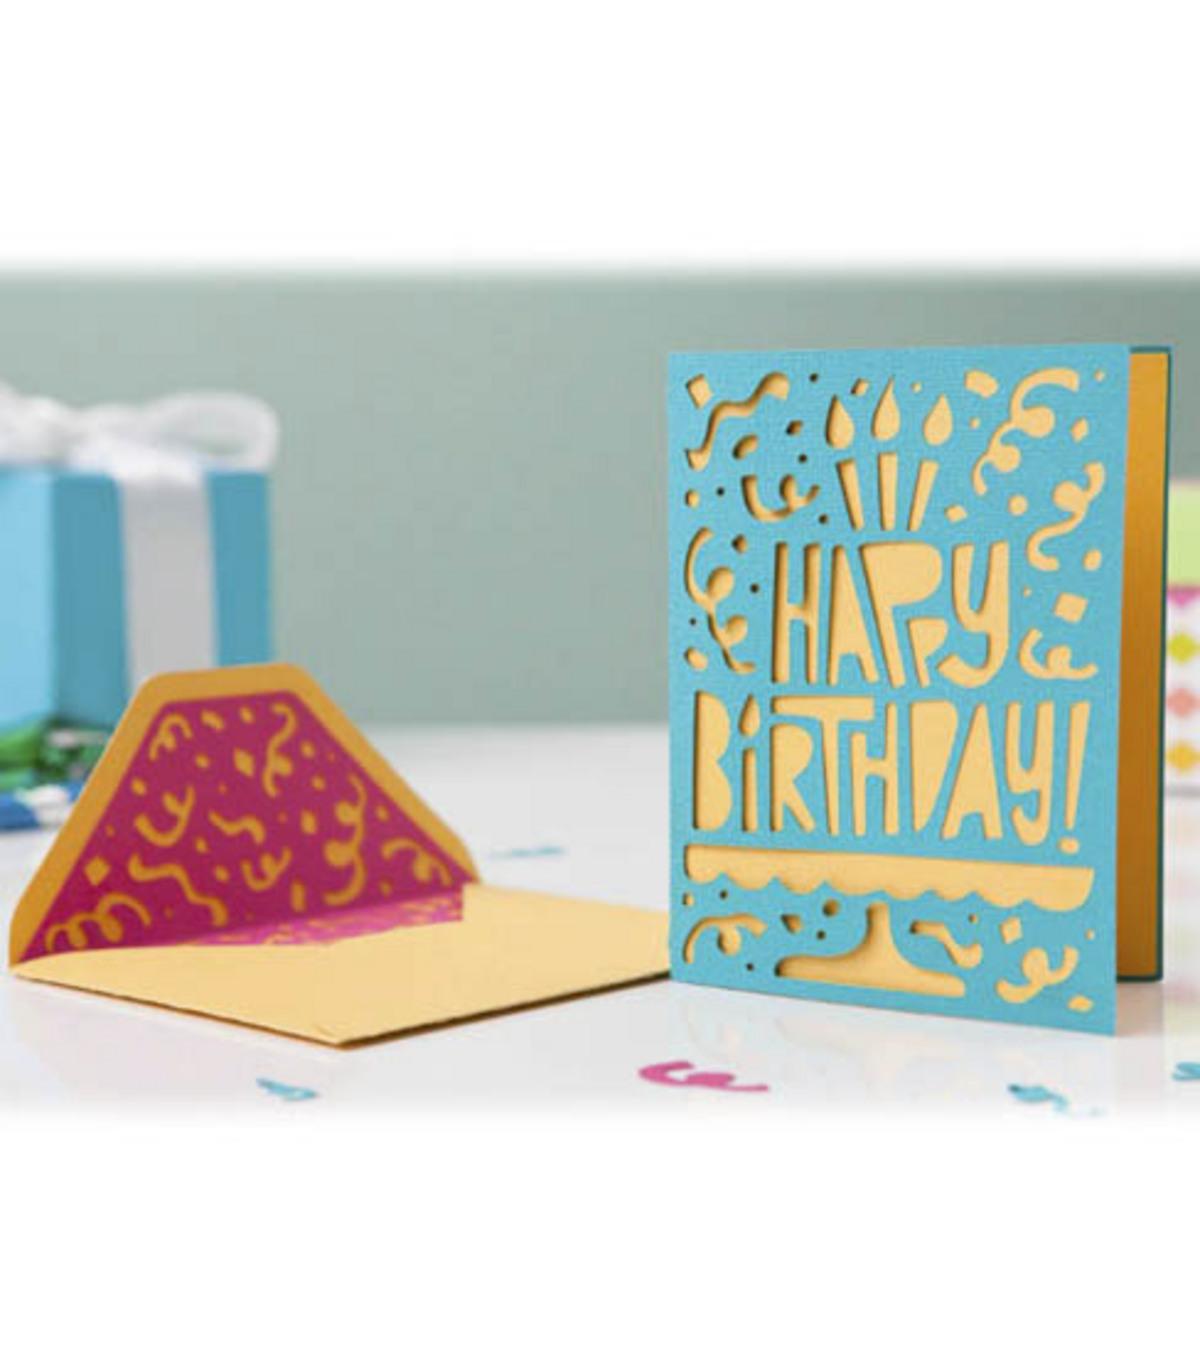 cricut mini celebrate card and envelope joann rh joann com Cricut Owner's Manual Cricut Expression Manual